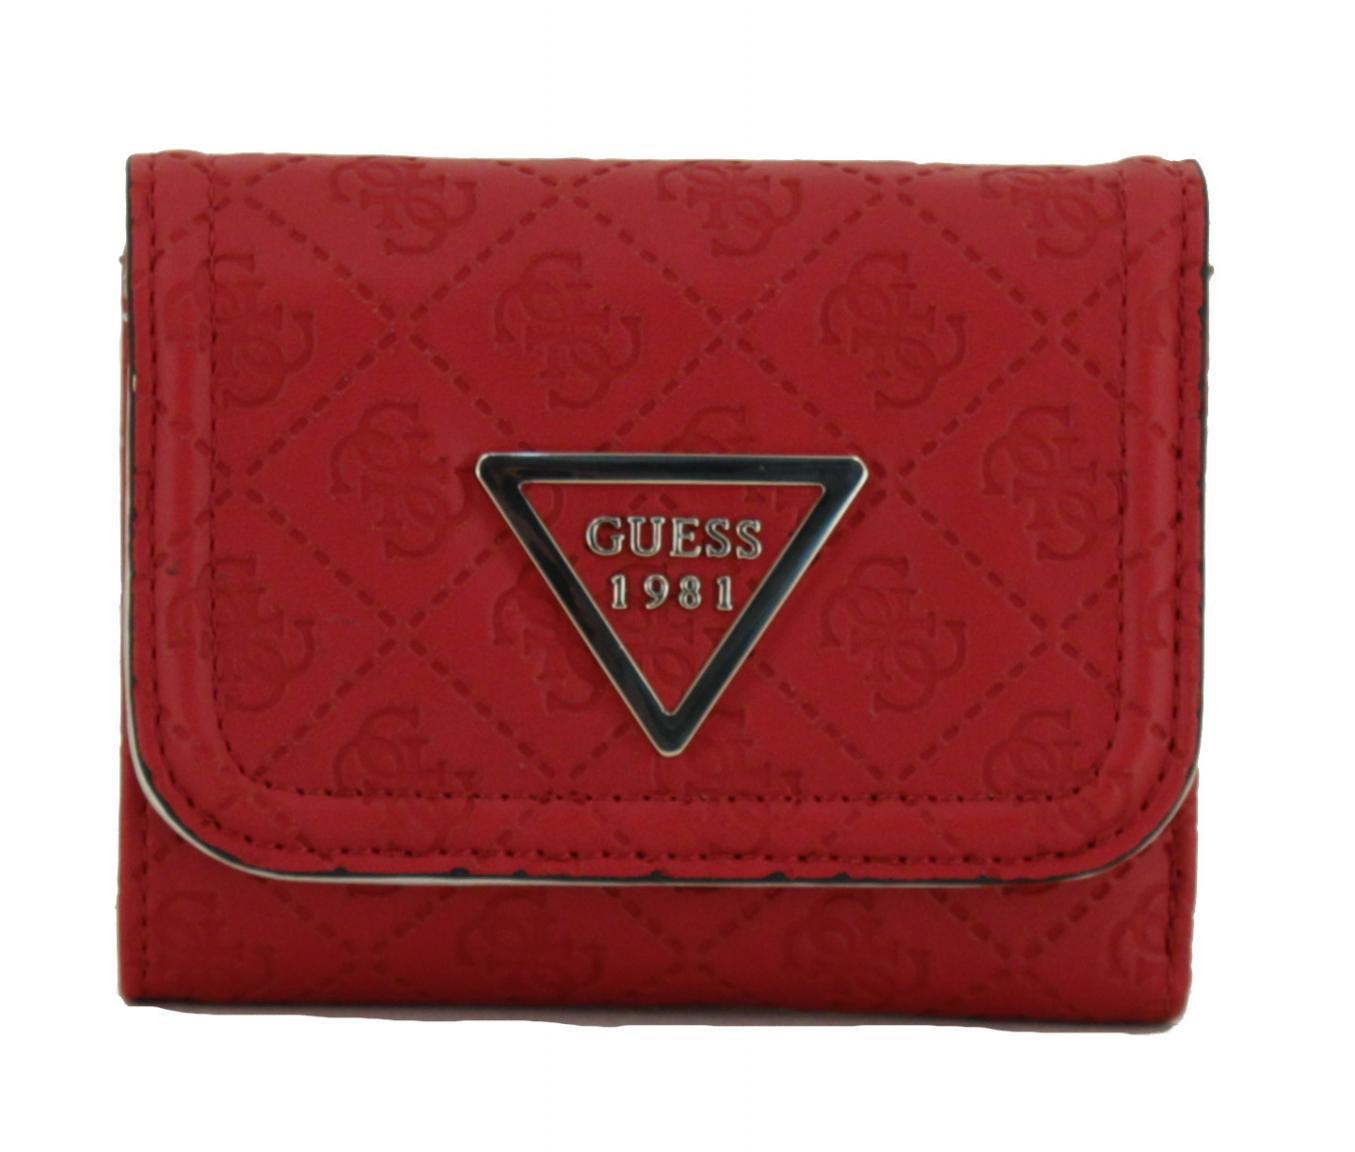 dc932b13c823e Guess Portemonnaie Lyra Red Logoprägung Überschlag rot - Bags   more